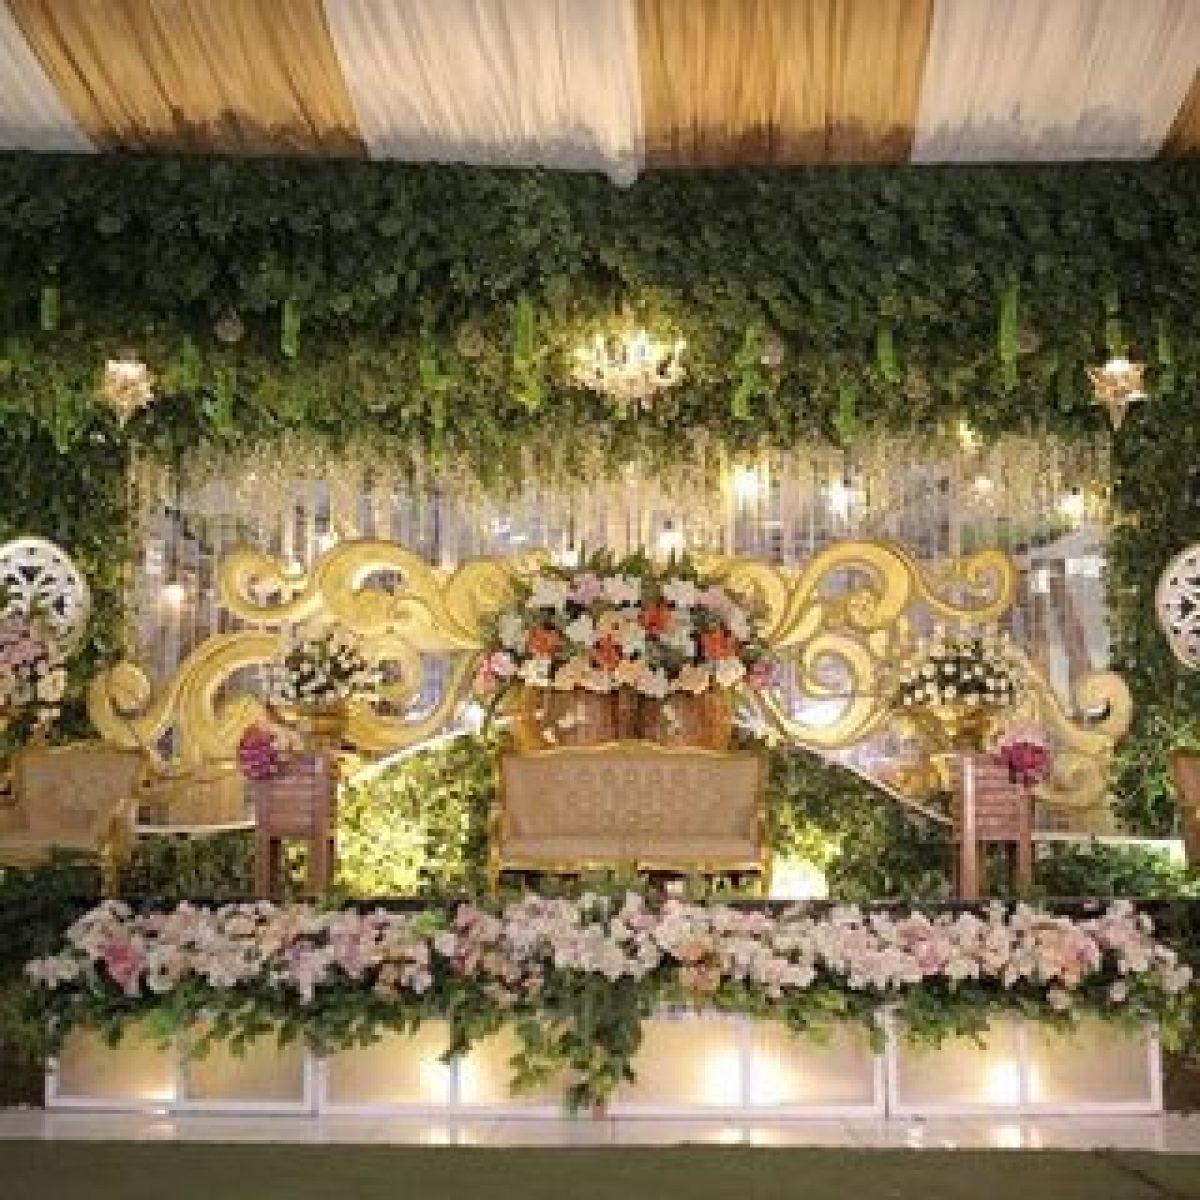 10 Jasa Dekorasi Pernikahan Subang Terbaik Heikamucom